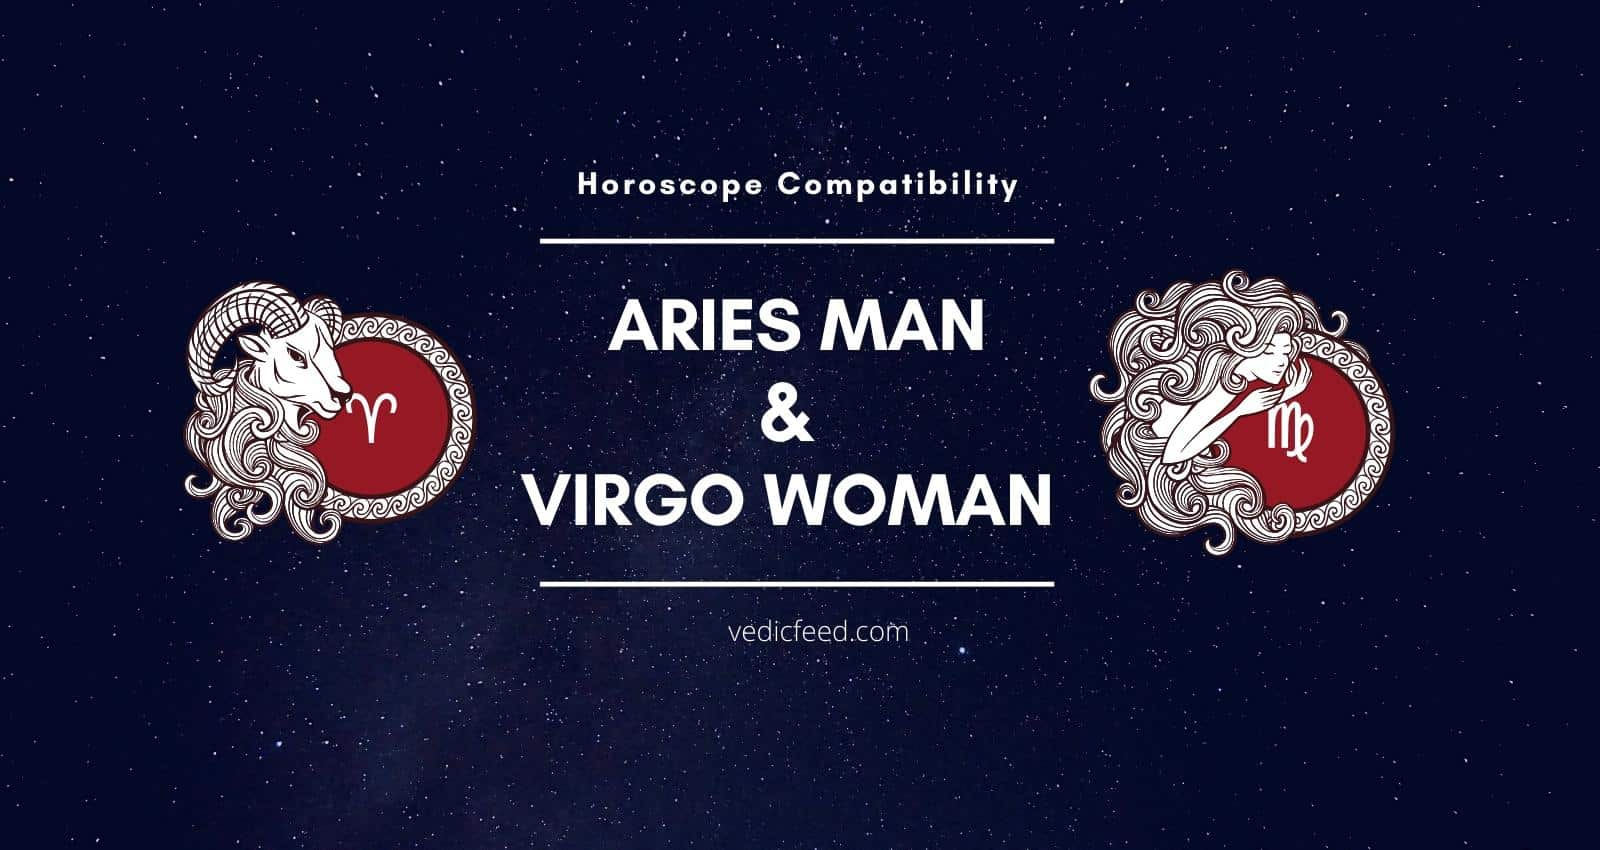 Aries Man and Virgo Woman